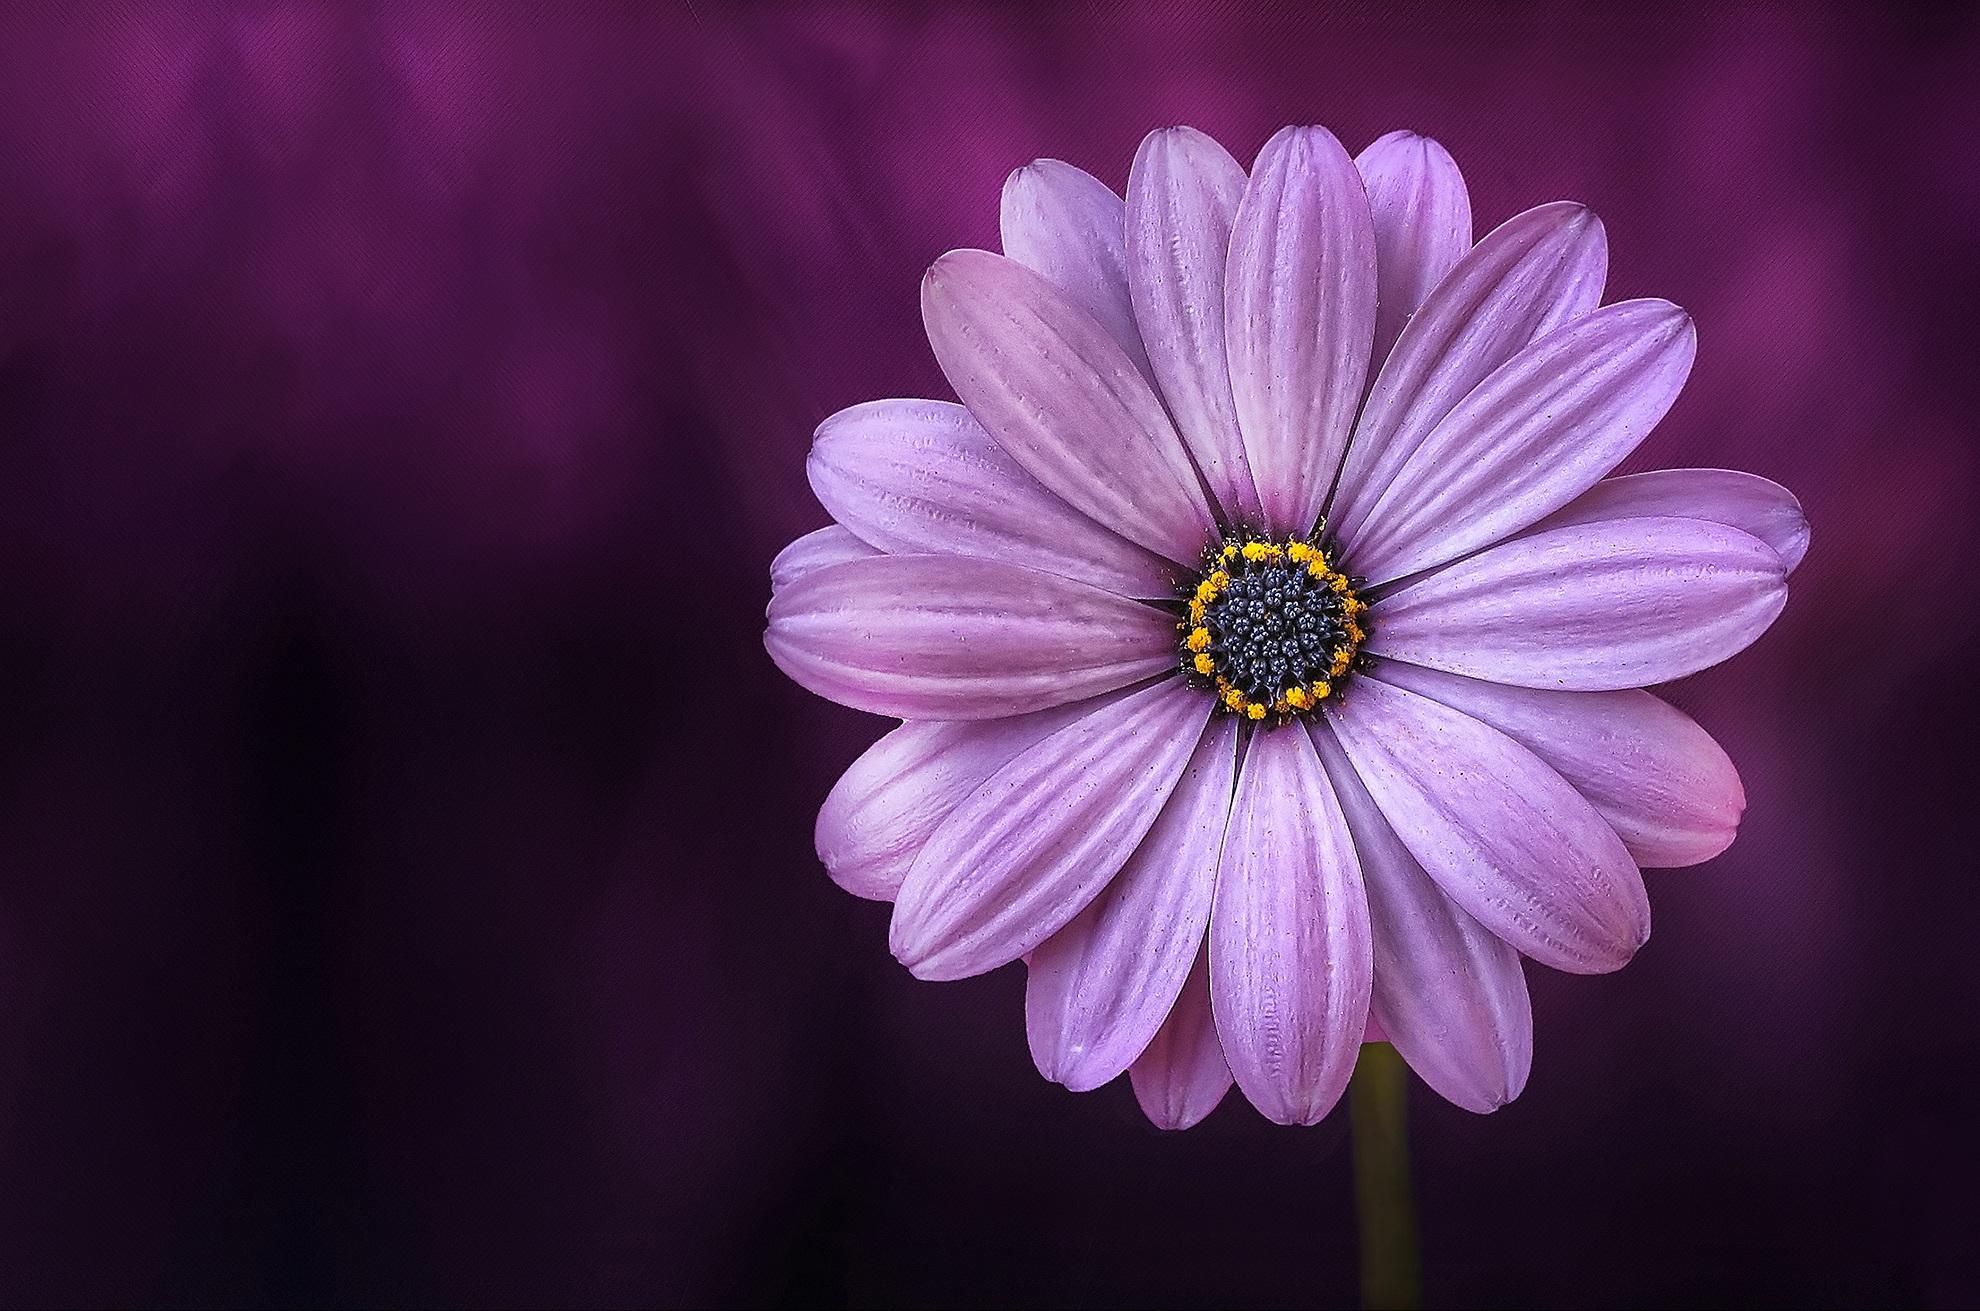 flower-purple-lical-blosso.jpg